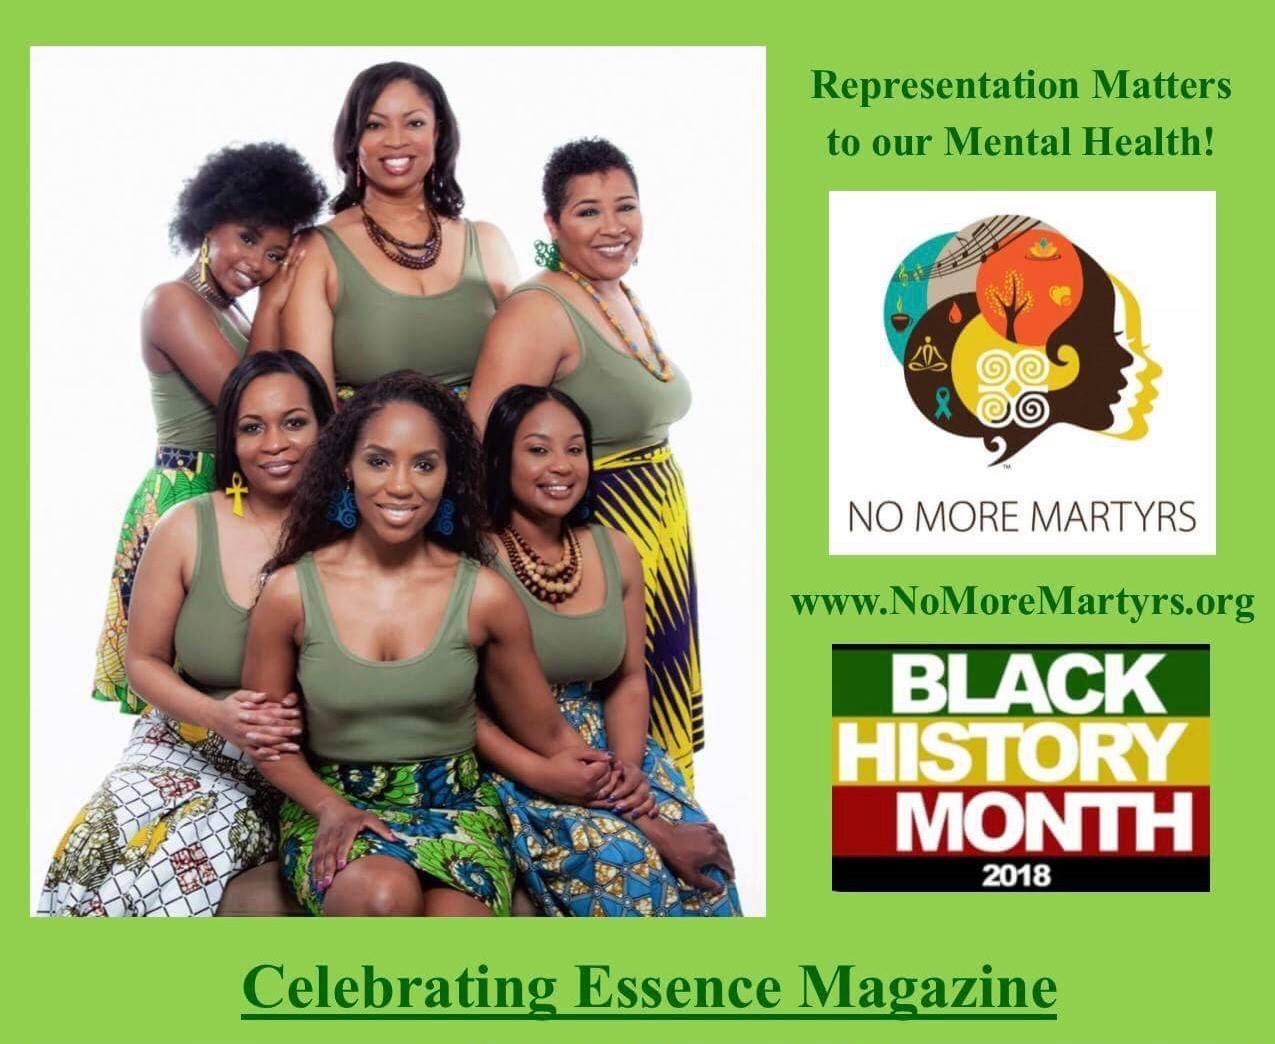 No More Martyrs Celebrates Essence Magazine No More Martyrs